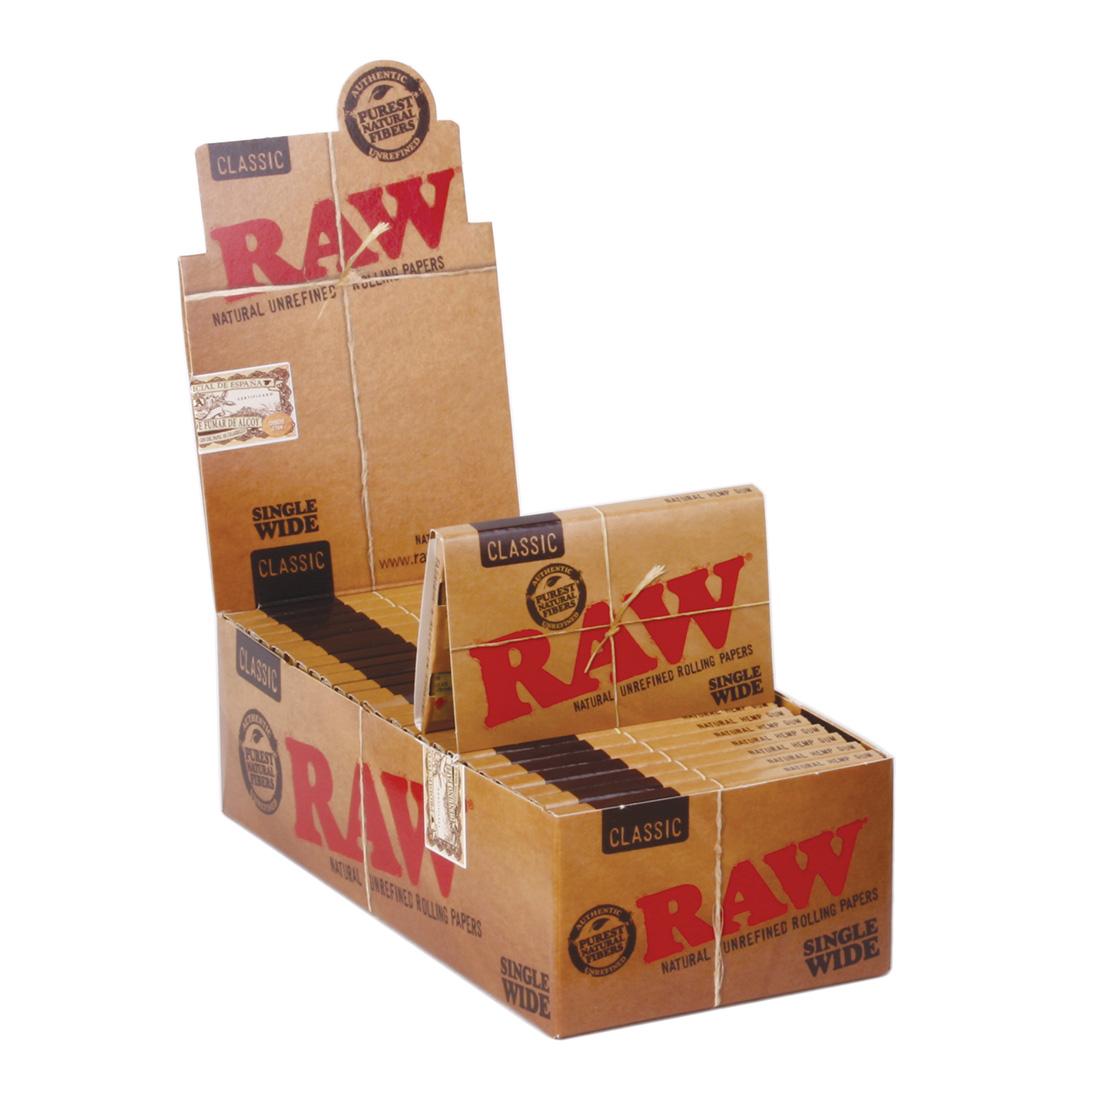 rawx10_bis